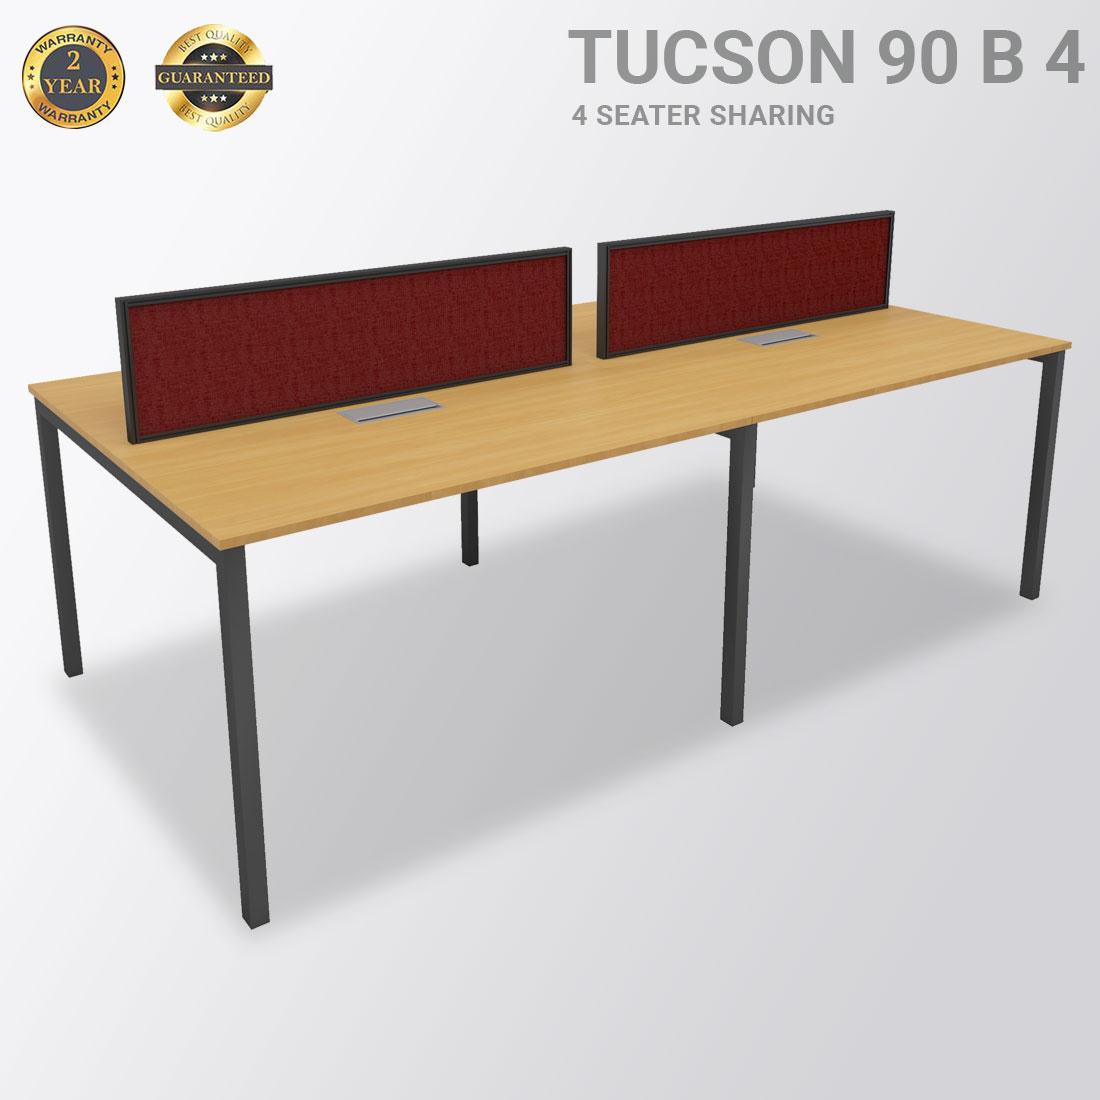 TUCSON 90 B 4 SEATER  SHARING